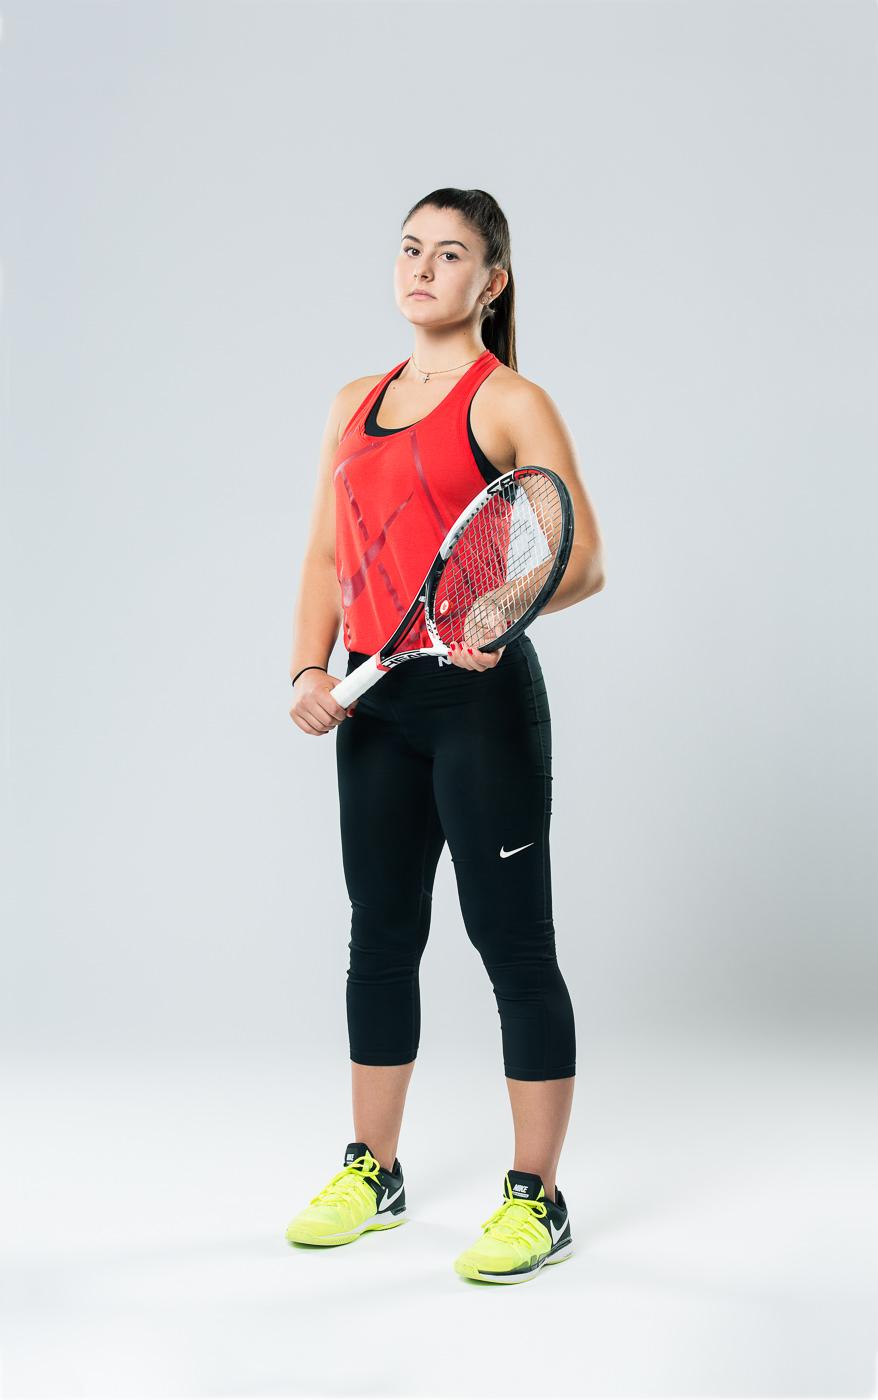 Portrait joueuse Tennis Canada Bianca Andreescu (2)